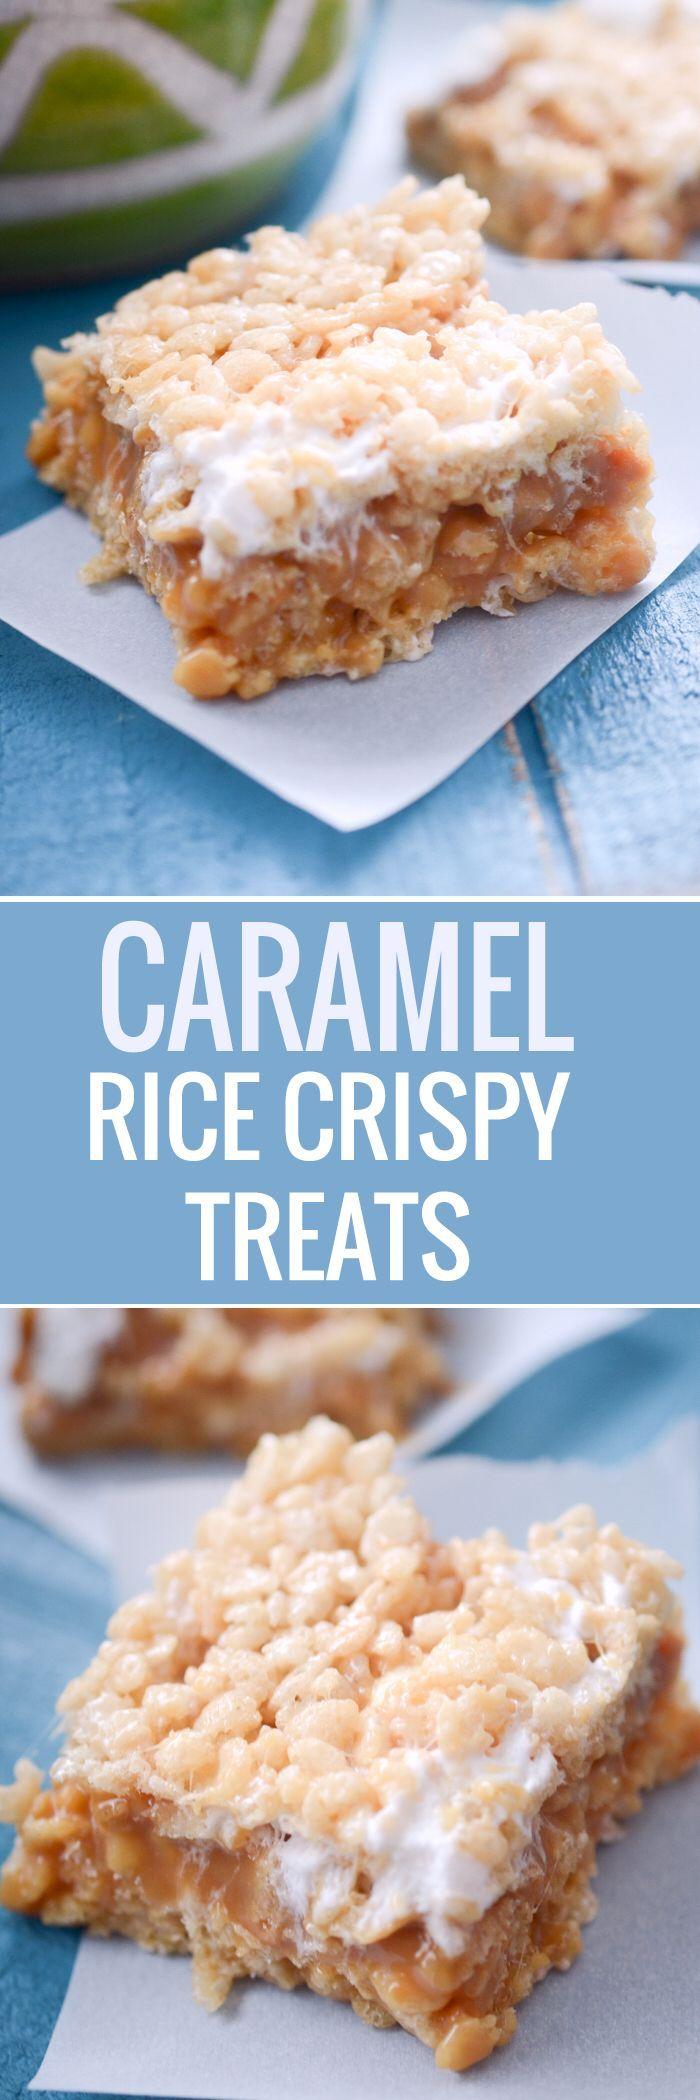 Caramel Rice Crispy Treats and Star Wars #crispytreats